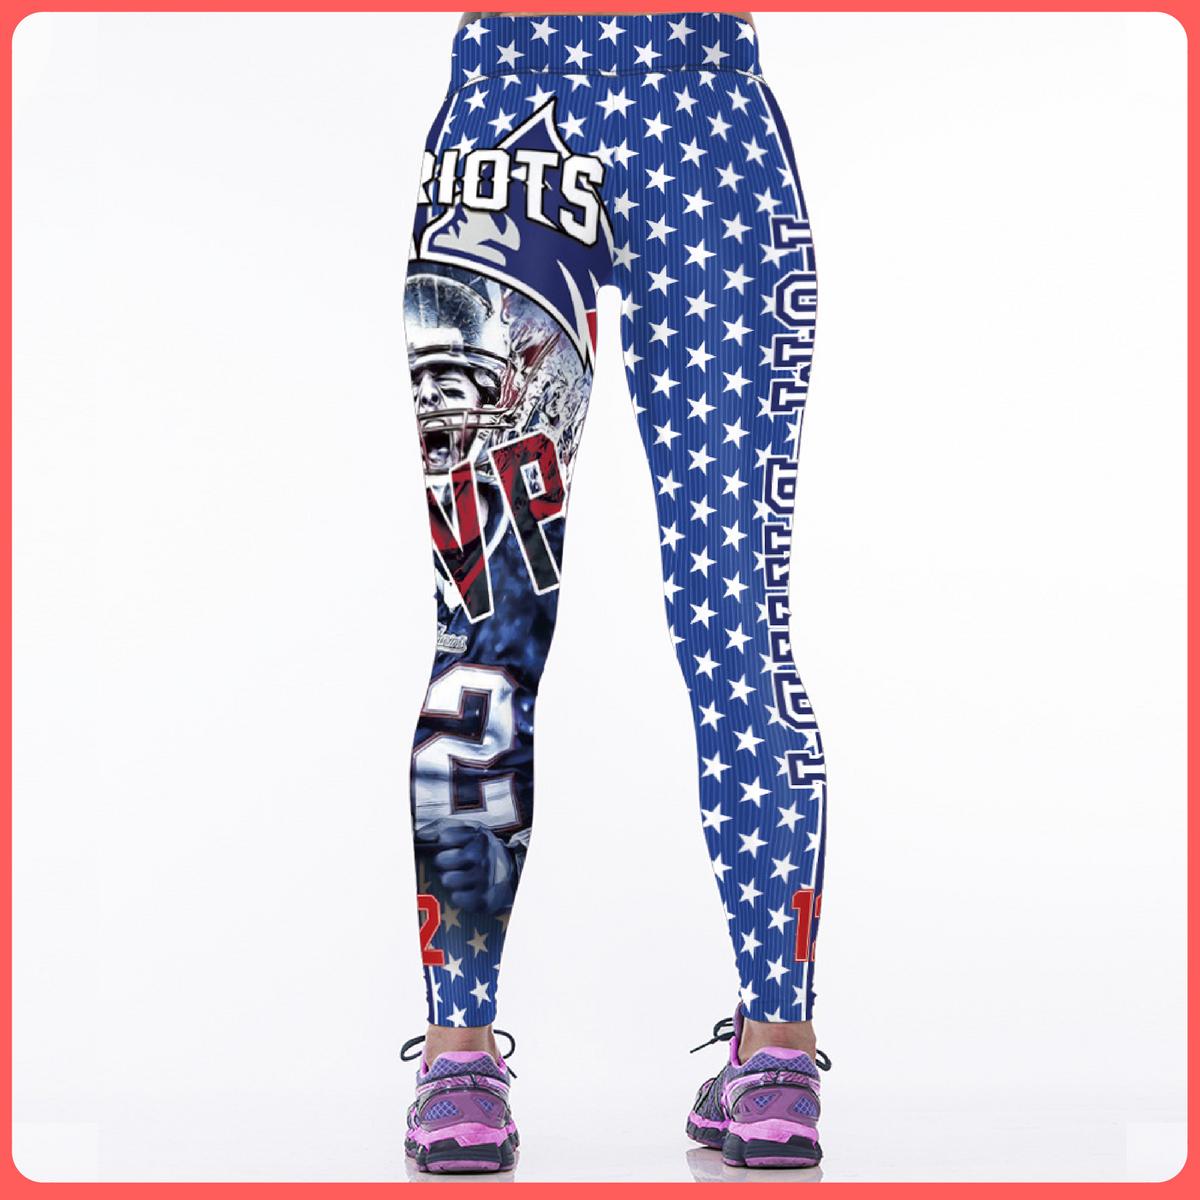 I Love New England Patriots Women S Sports Leggings Printed Yoga Pants Sports Leggings